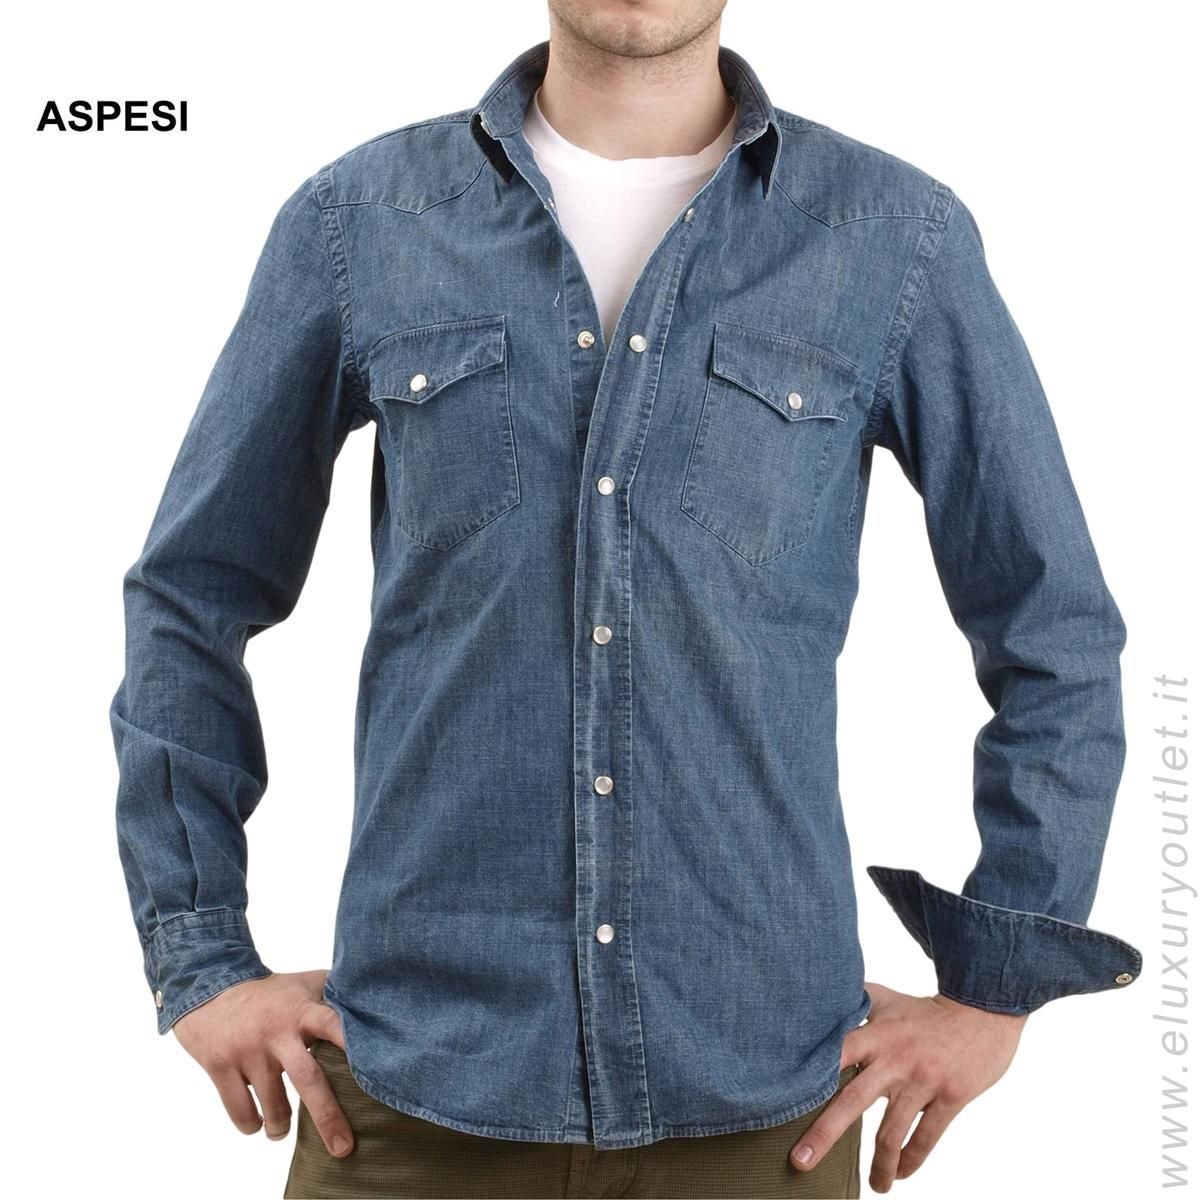 #Denim #Shirt #Aspesi -70% su #eluxuryoutlet!!! >> http://www.eluxuryoutlet.it/it/camicia-aspesi-6.html